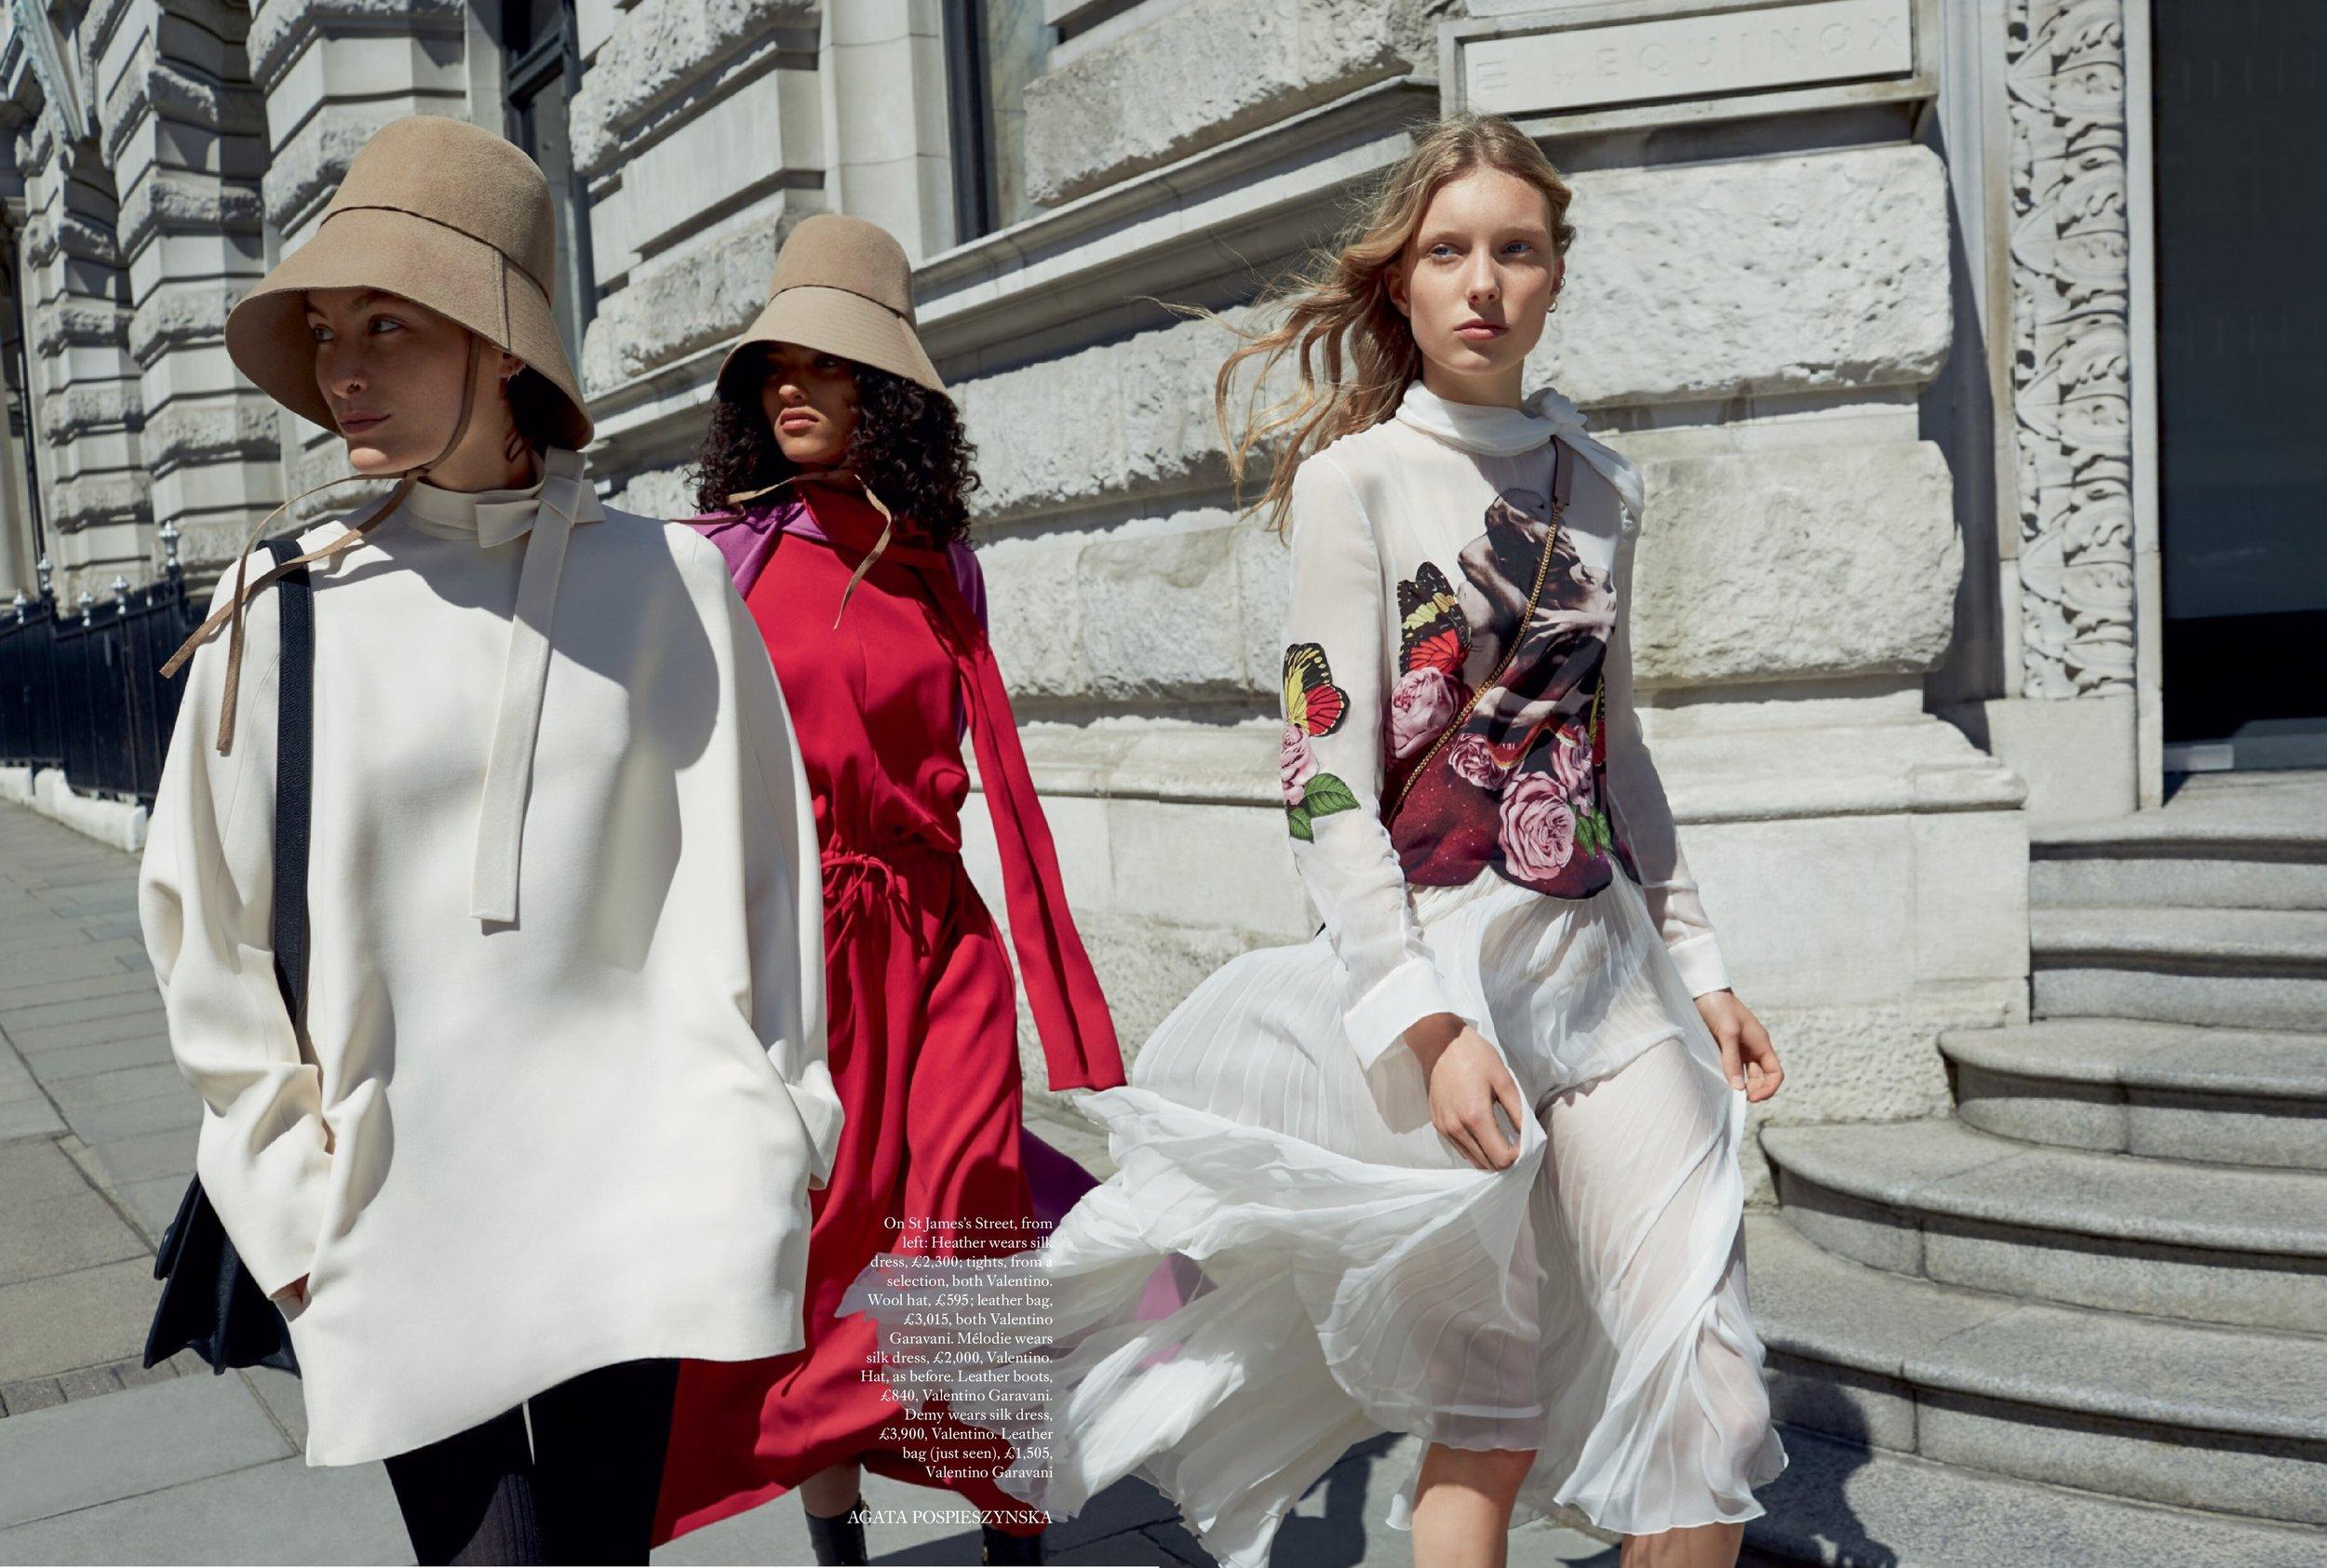 Agata Popieszynska-Girls Are Back in Town Harper's Bazaar UK Aug 2019 (39).jpg